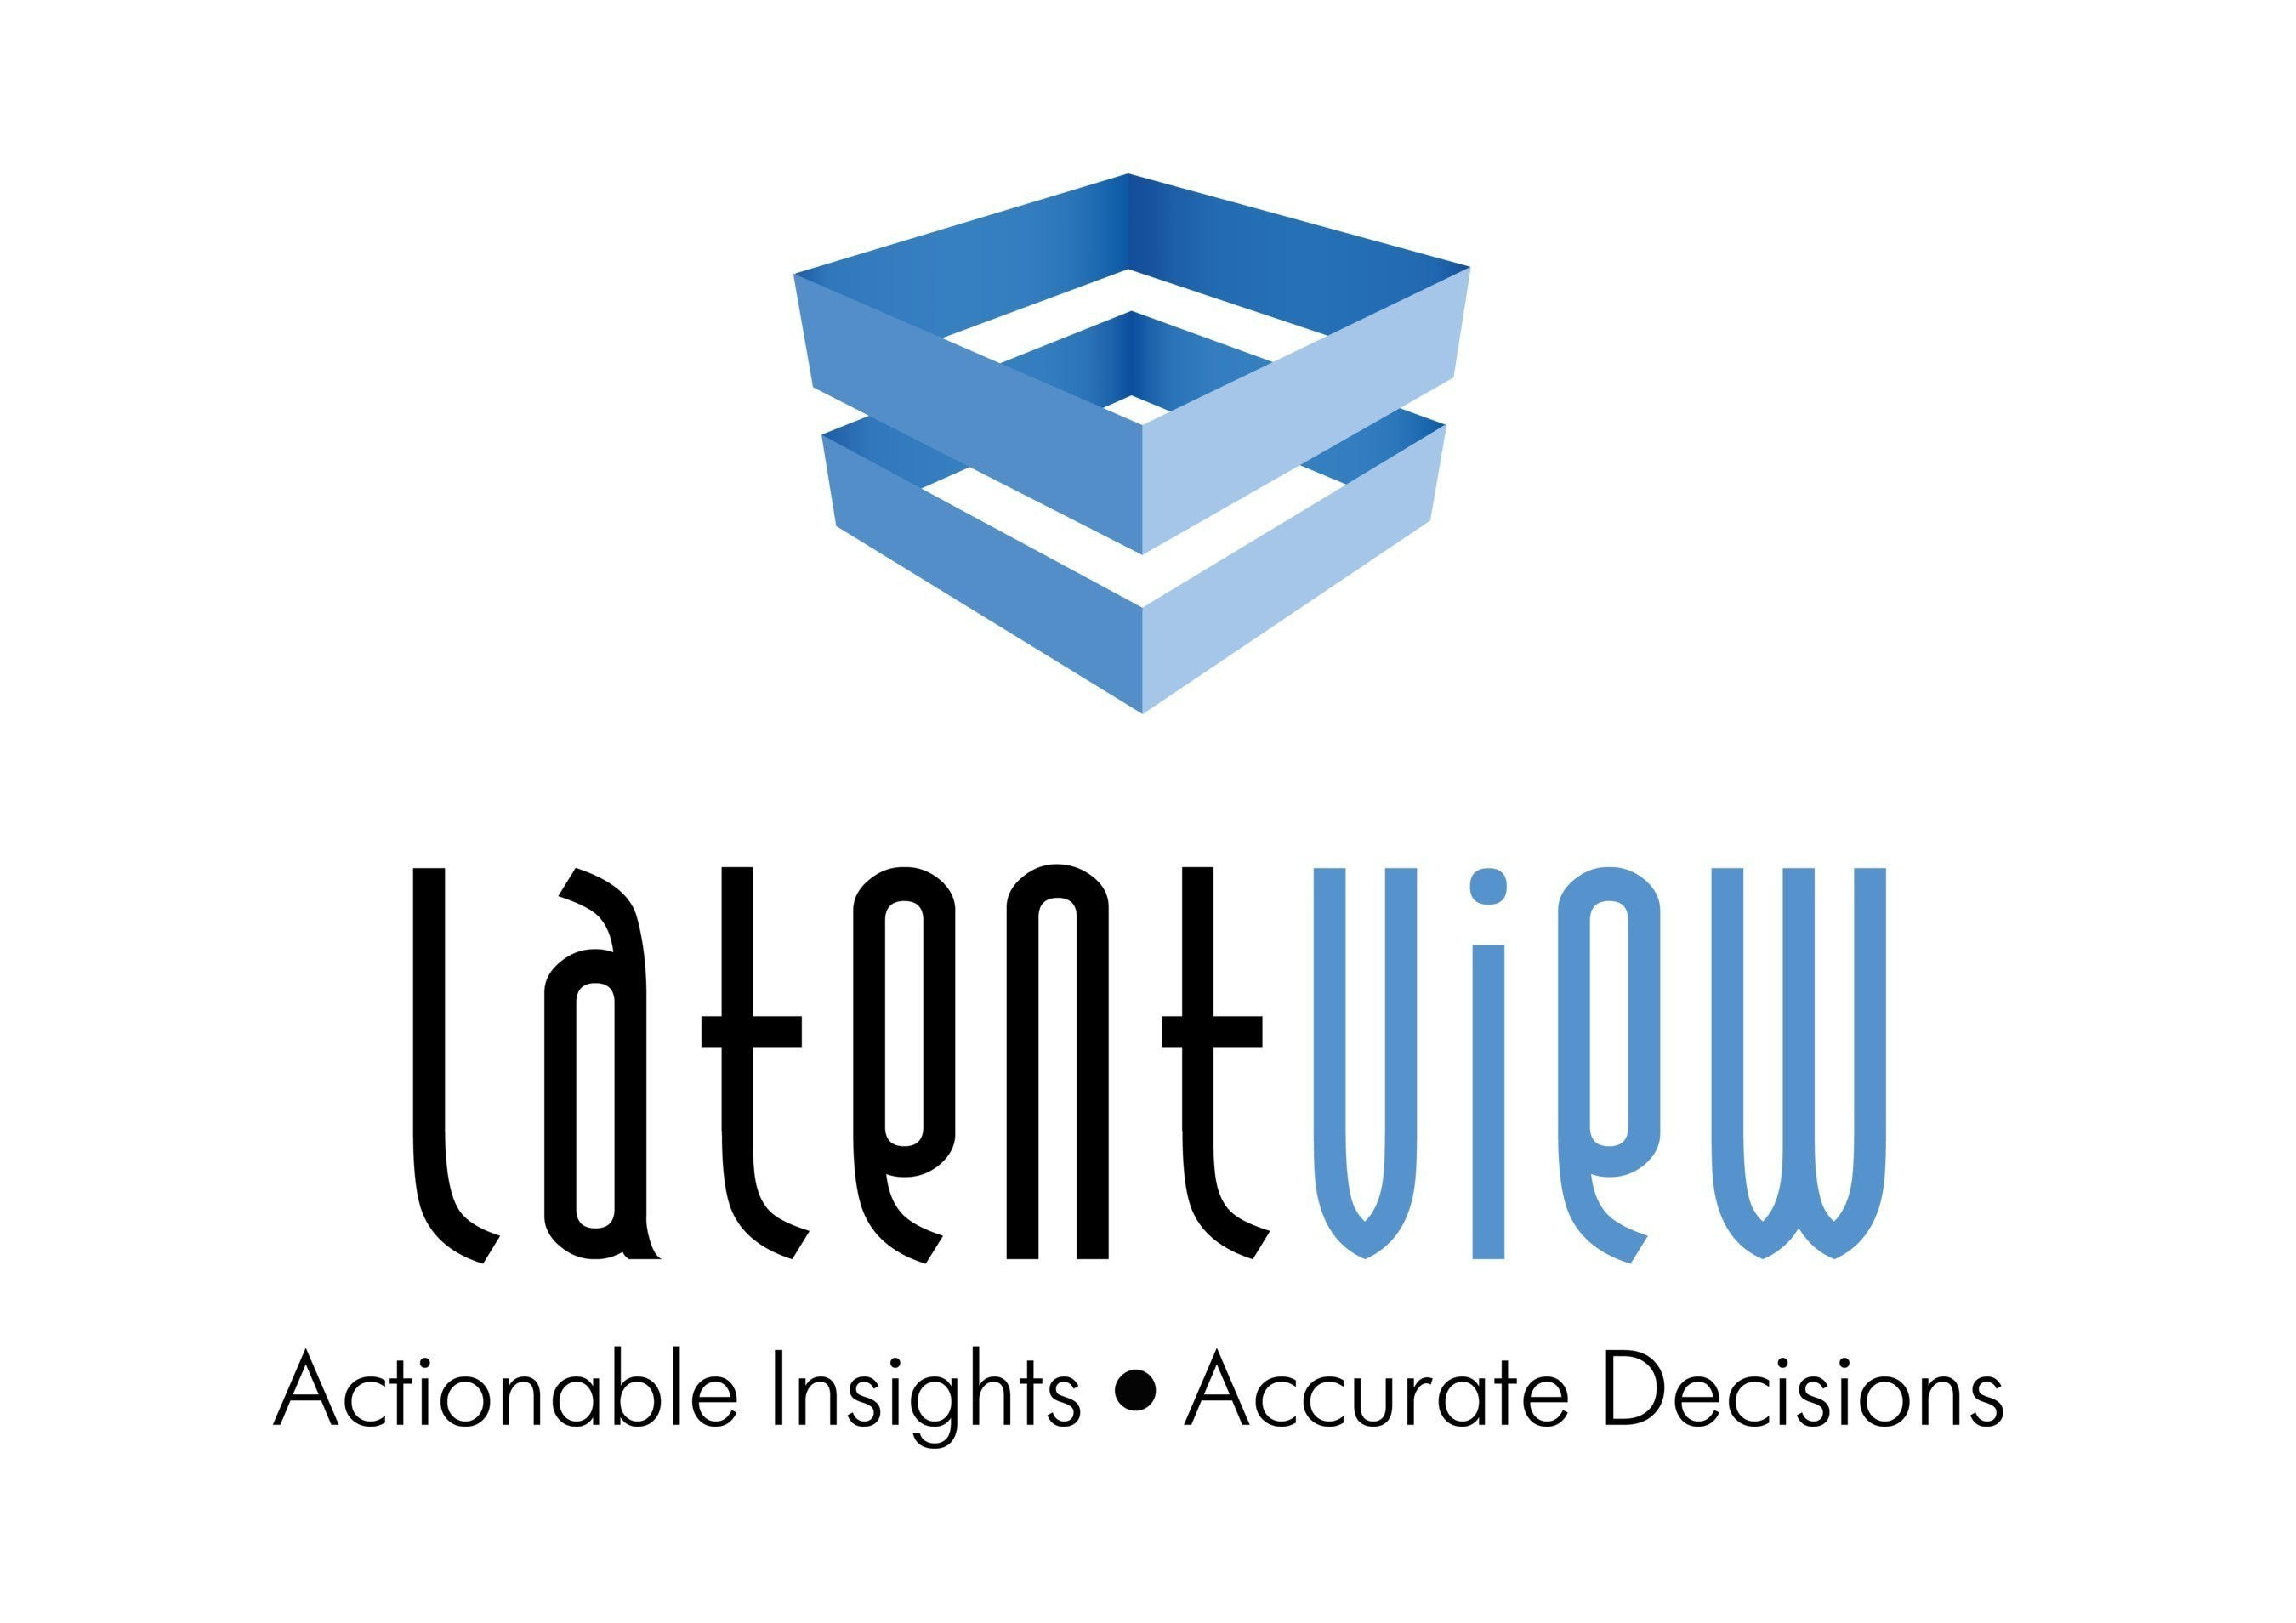 www.latentview.com